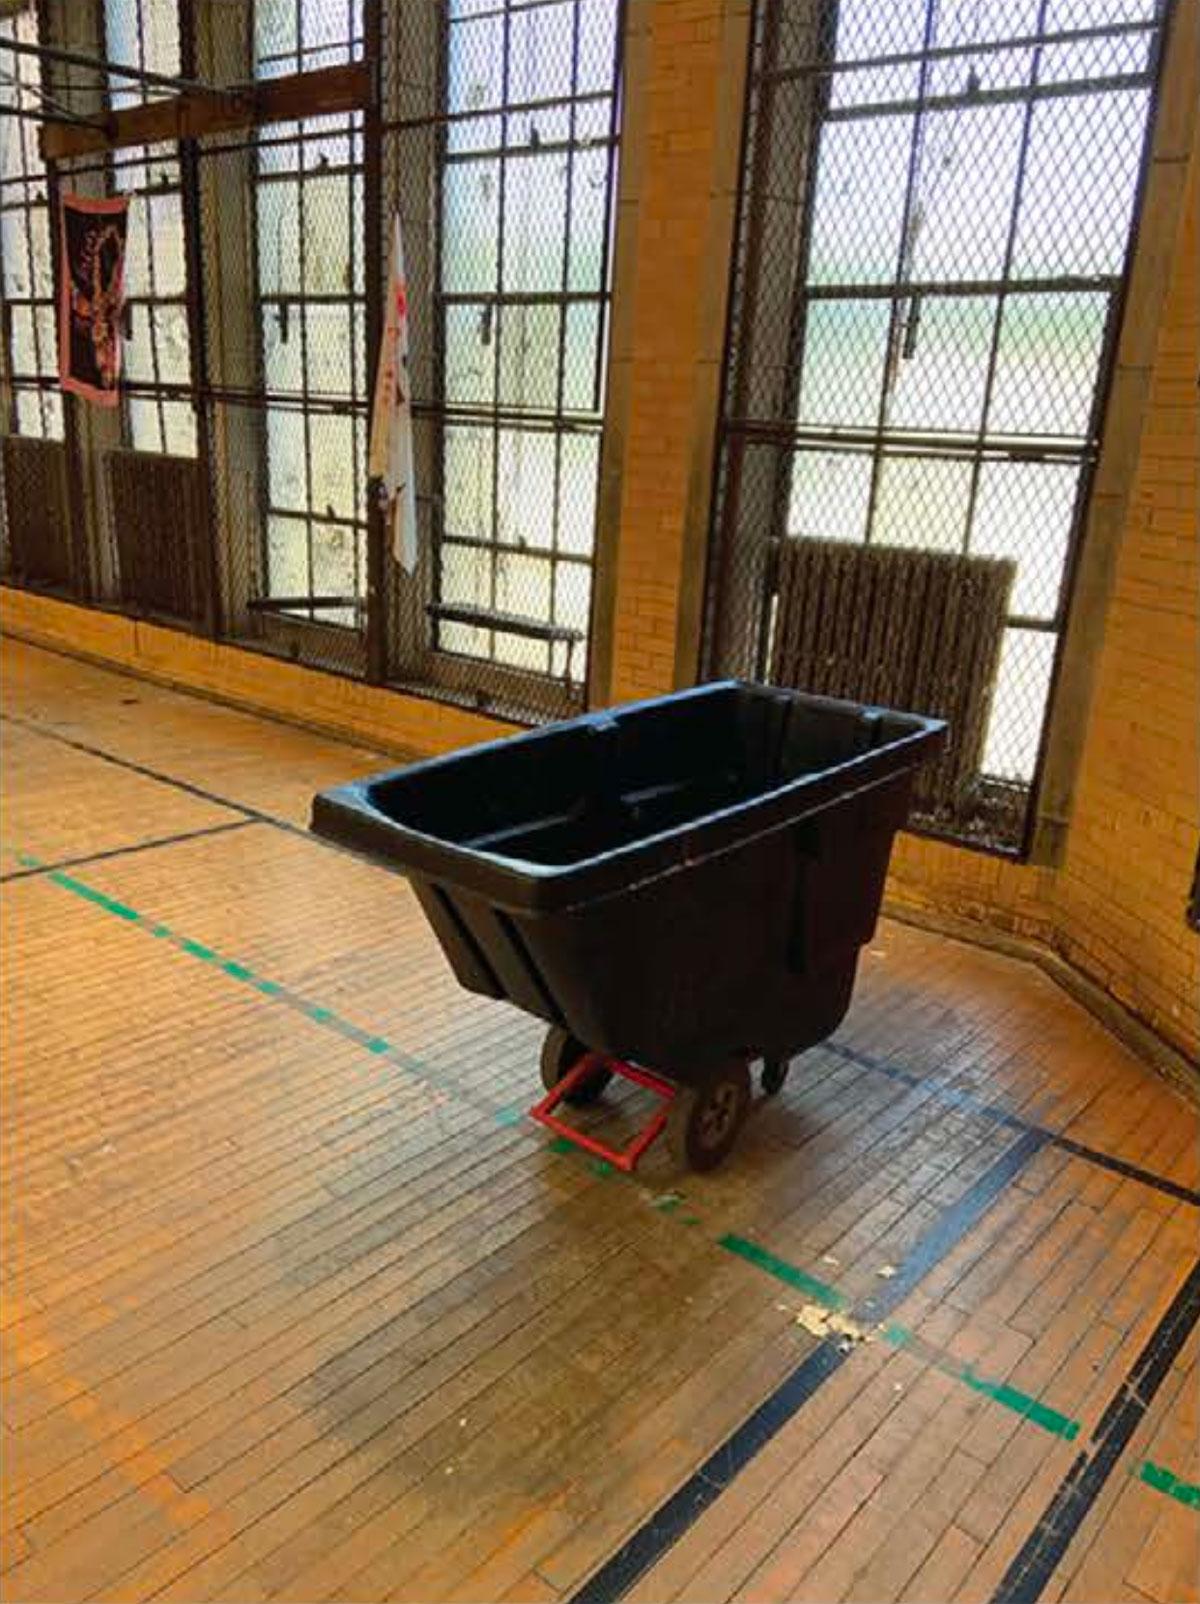 A rolling bin used to catch leaking water